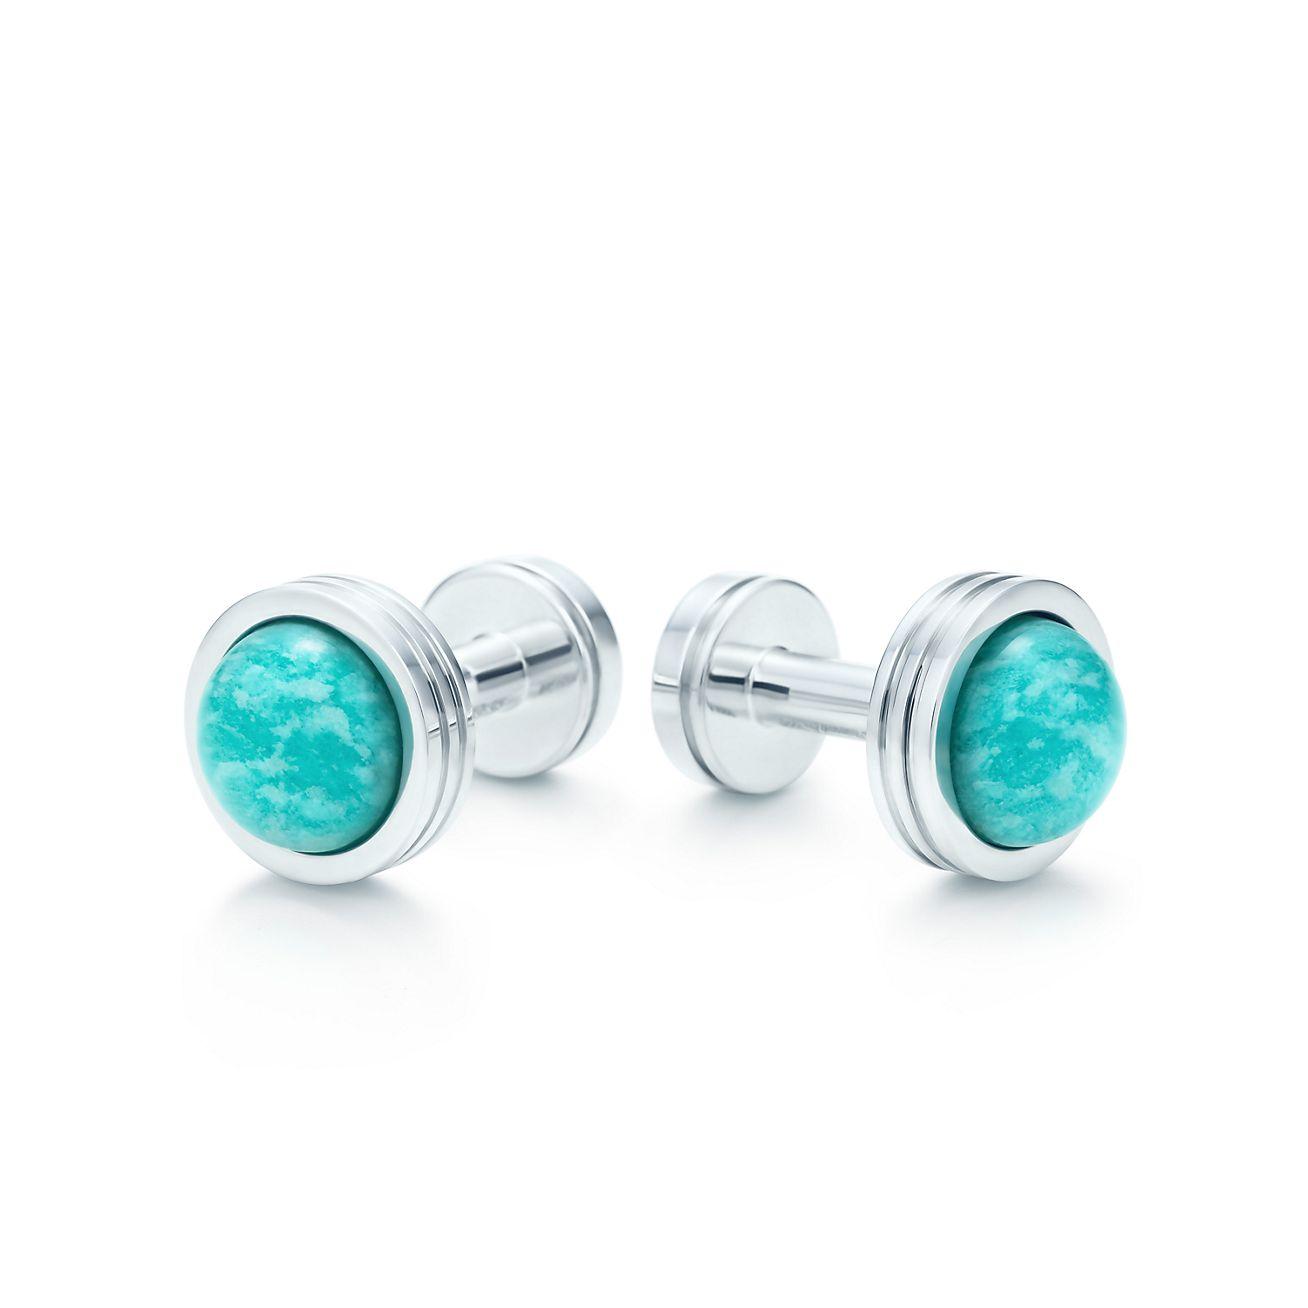 31d981cf9 ... amazonite stud earrings; palomas sugar stacksring; palomas groove™ cuff  links ...